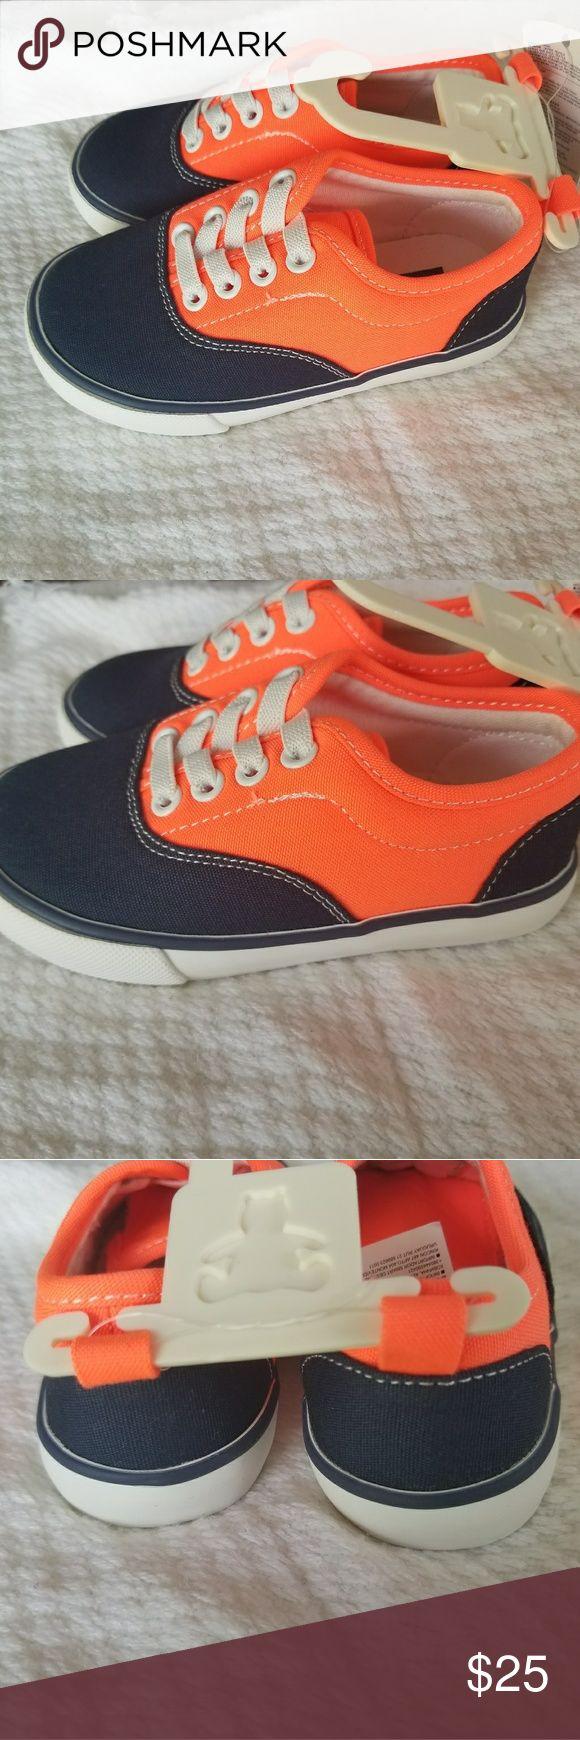 Selling this Babygap Orange And Blue Sneakers size 7 on Poshmark! My username is: urmusthaves. #shopmycloset #poshmark #fashion #shopping #style #forsale #babygap #Other